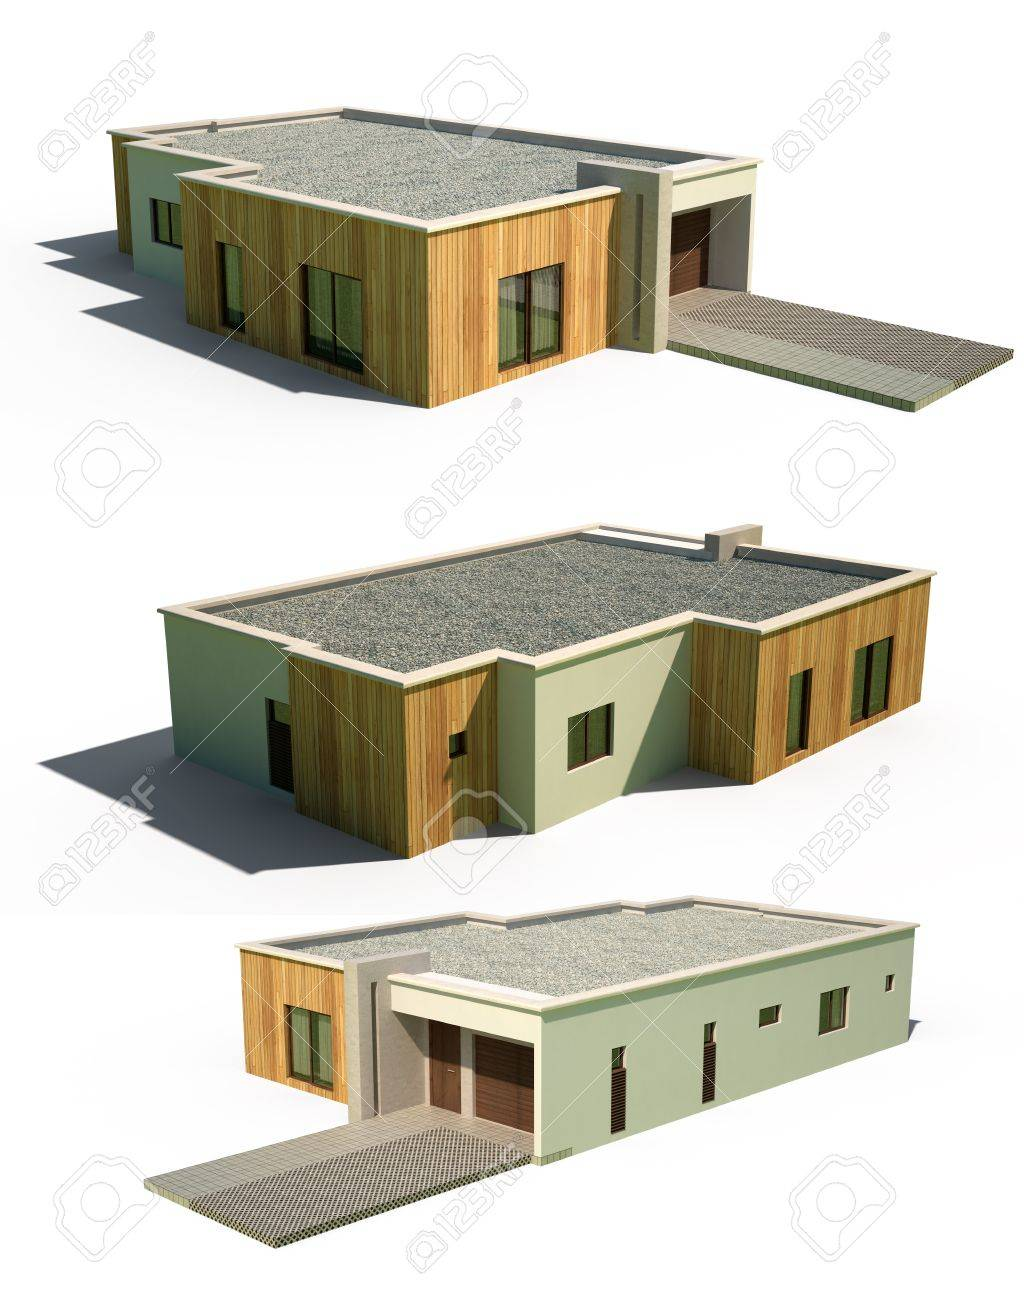 Hausfassade modern  3d Modern Hausfassade Außen Lizenzfreie Fotos, Bilder Und Stock ...